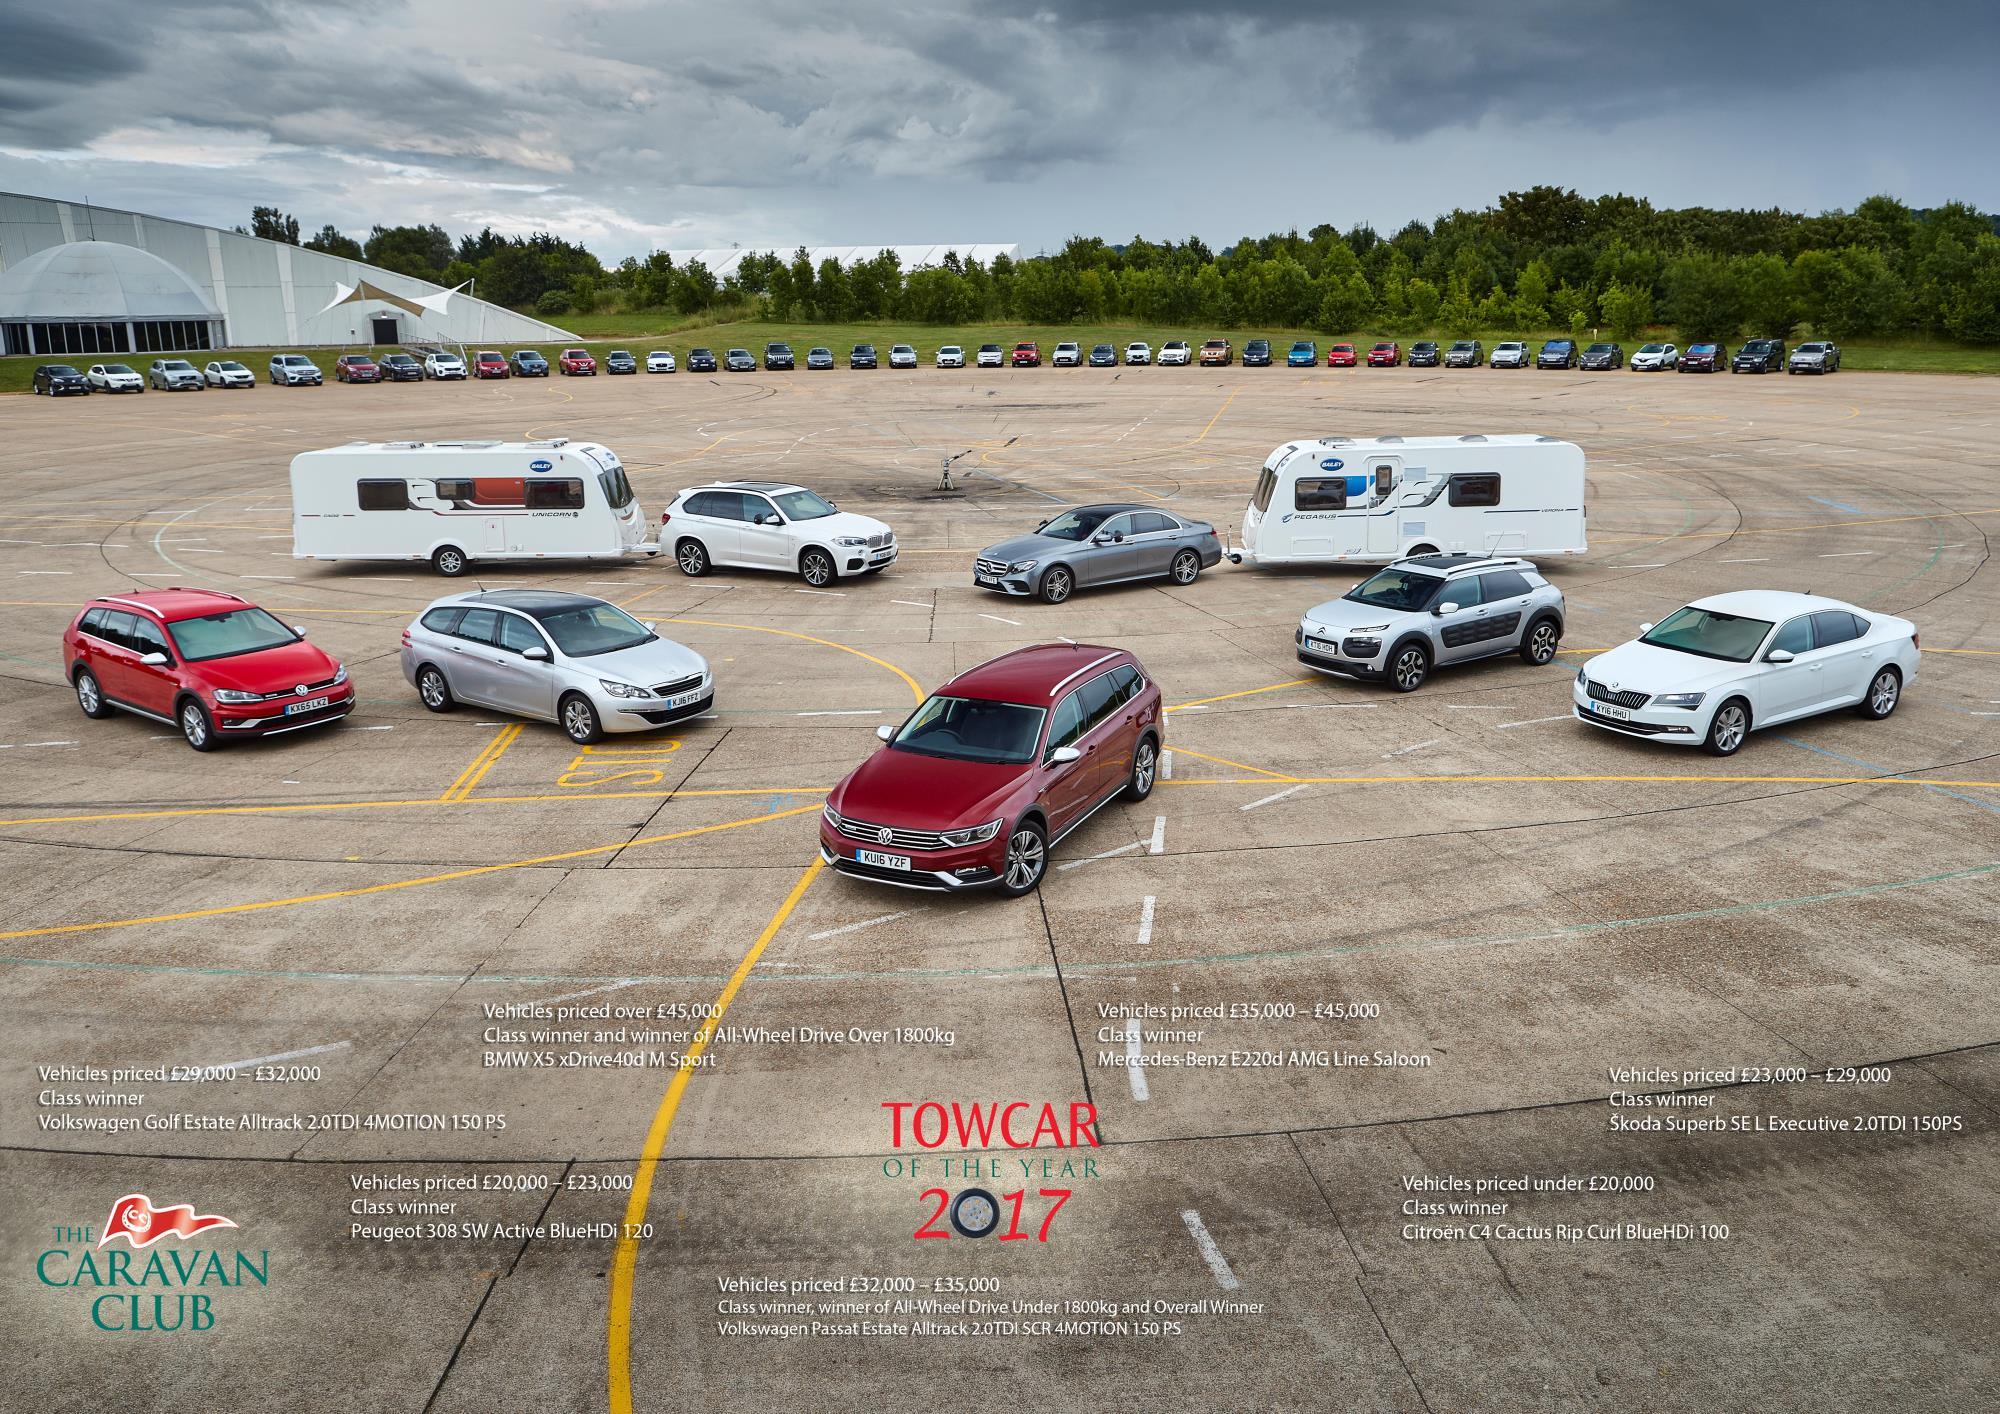 Audi Highland Park >> C7 Audi Exclusive Edition 1 Havana Brown Leather S6 at The Audi Exchange - Fourtitude.com